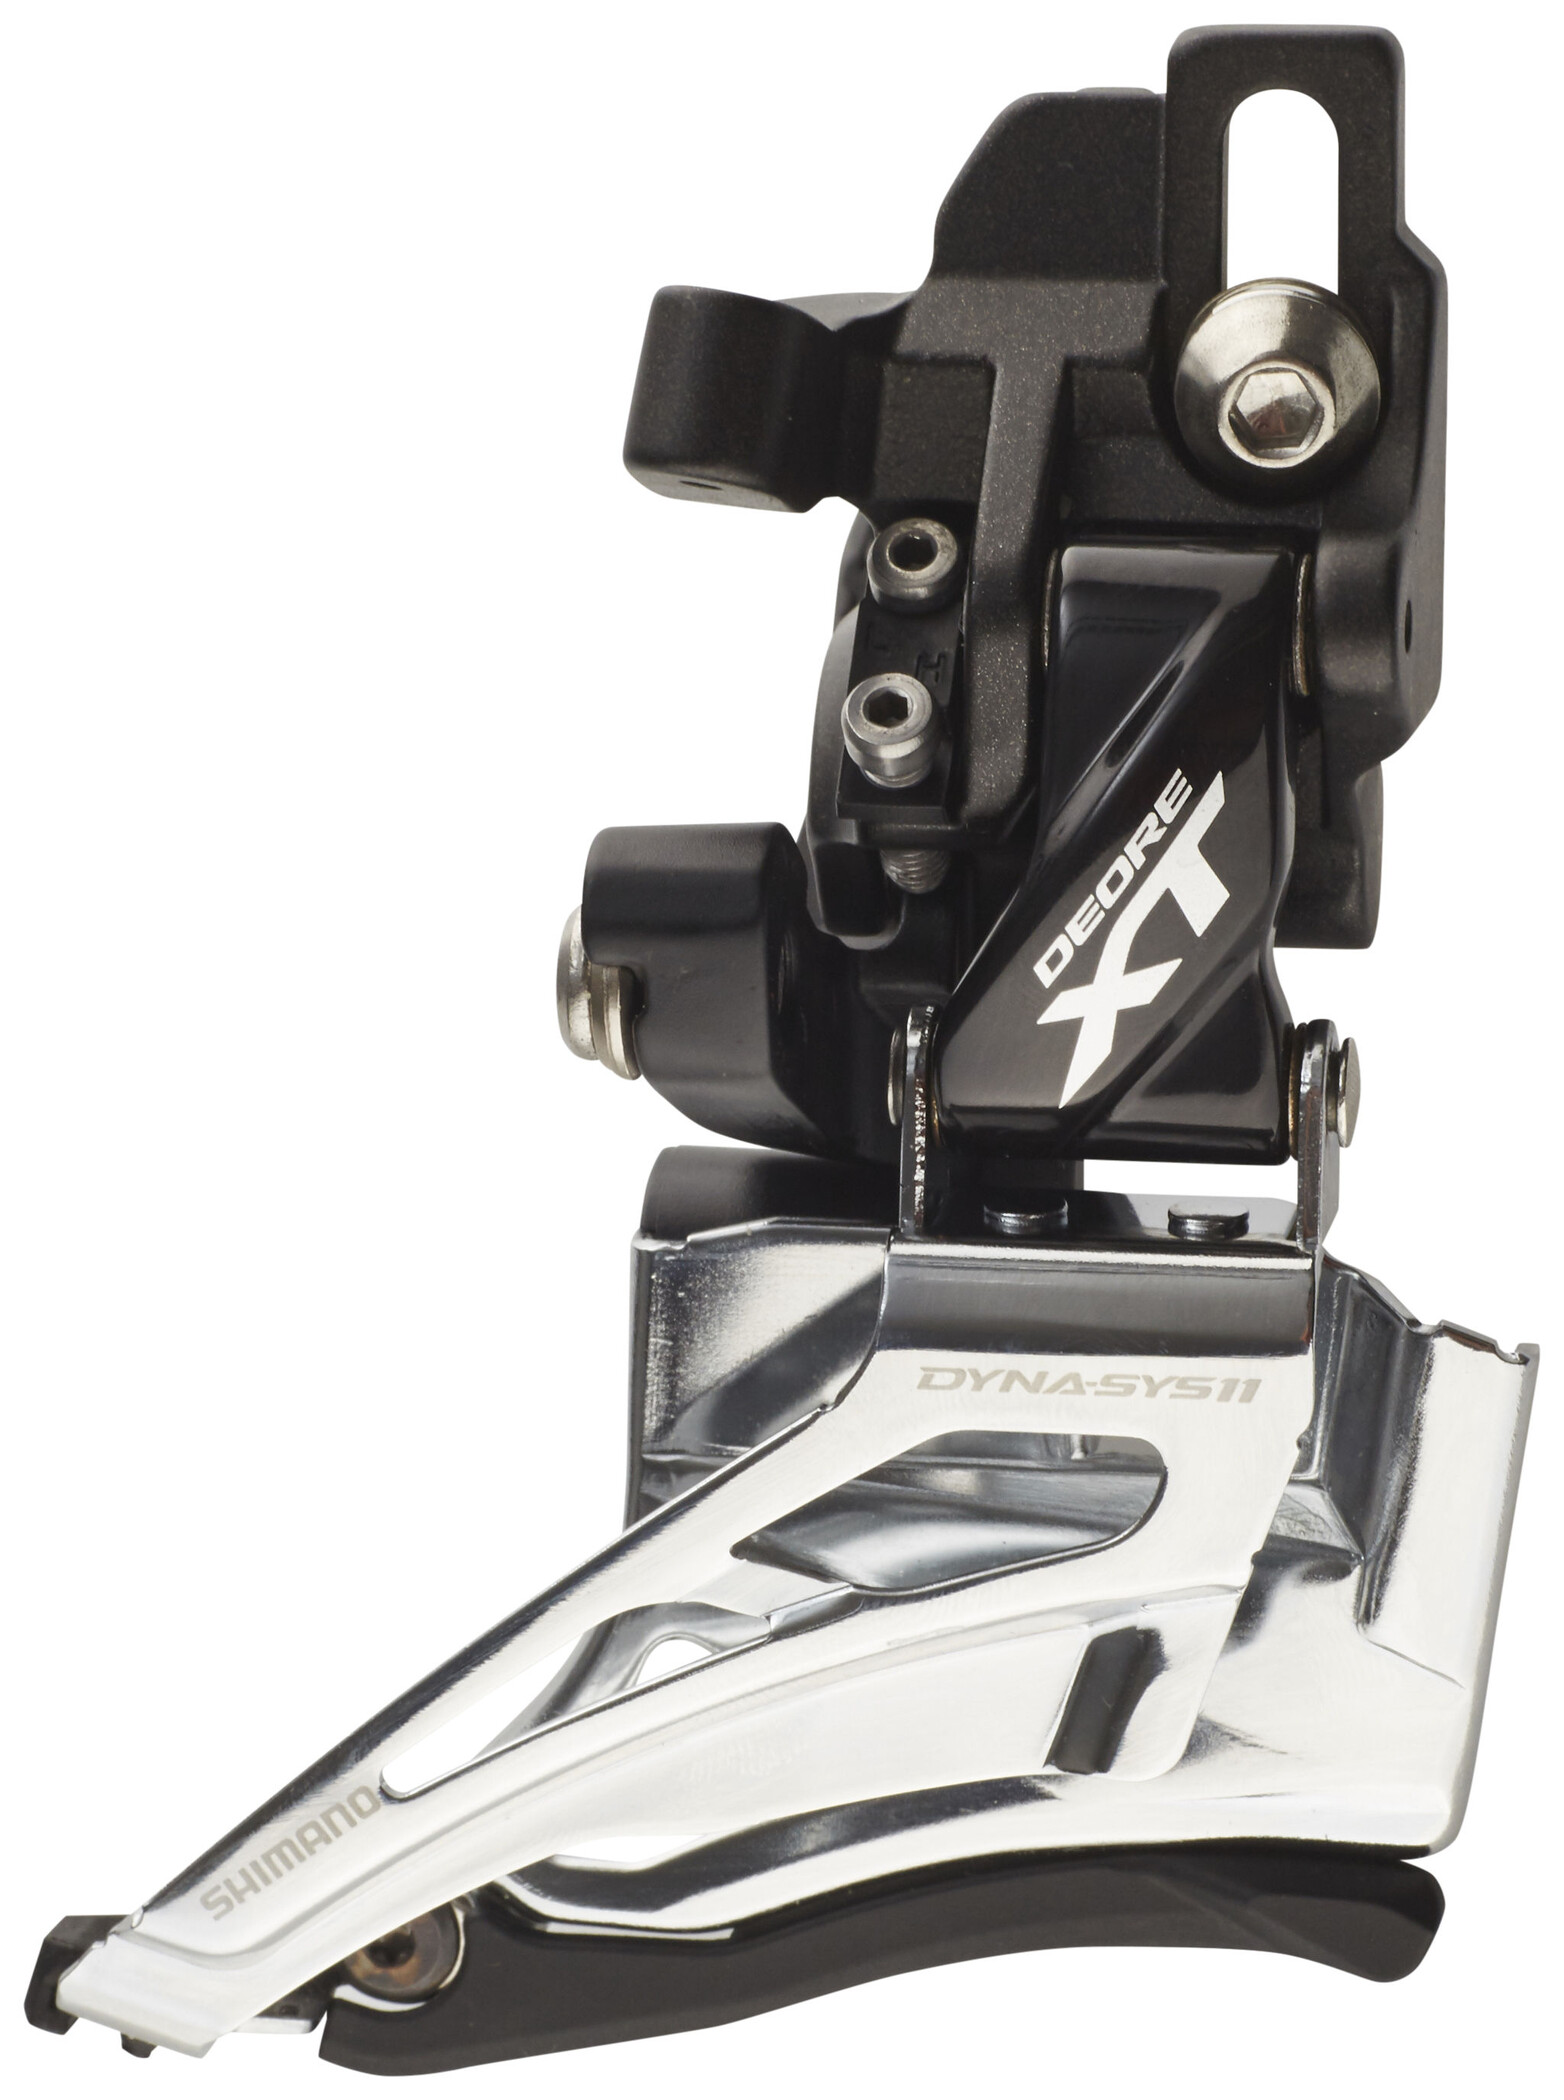 Shimano XT M8025-H 2x11 High Clamp Down Swing Dual Pull Front Derailleur